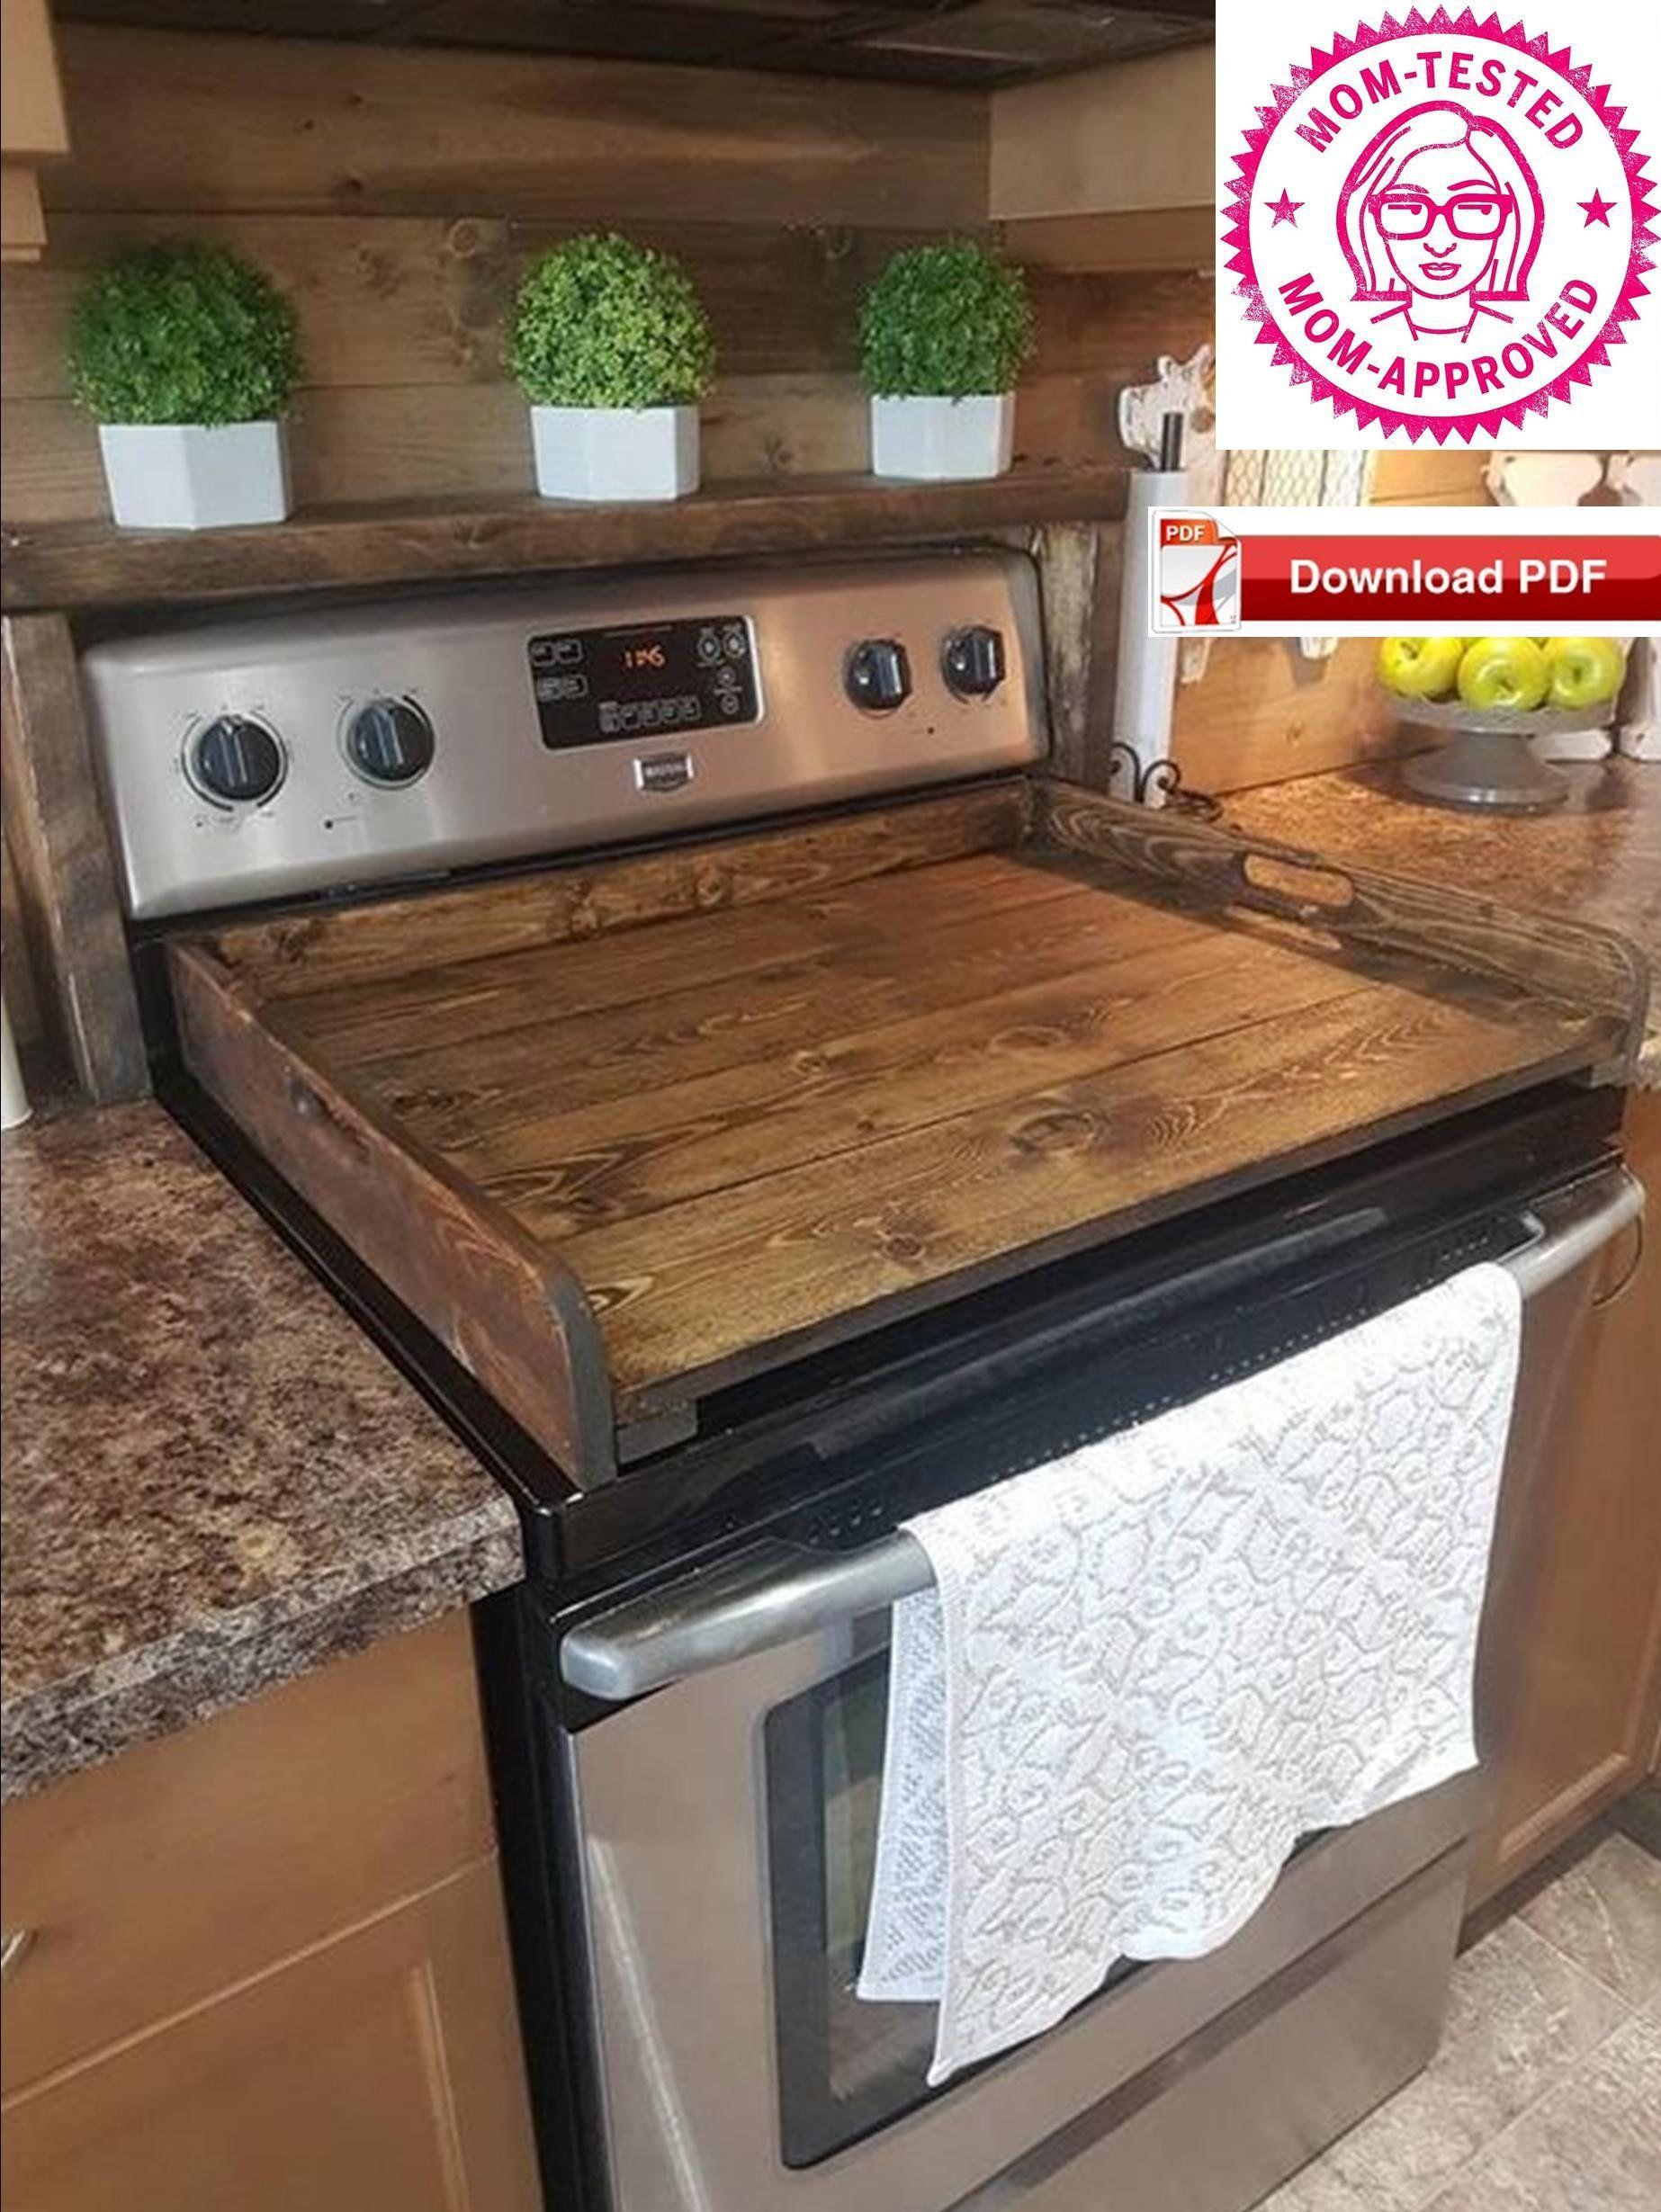 Noodle Board Plan/Kitchen Noodle Board Plan/ RV No